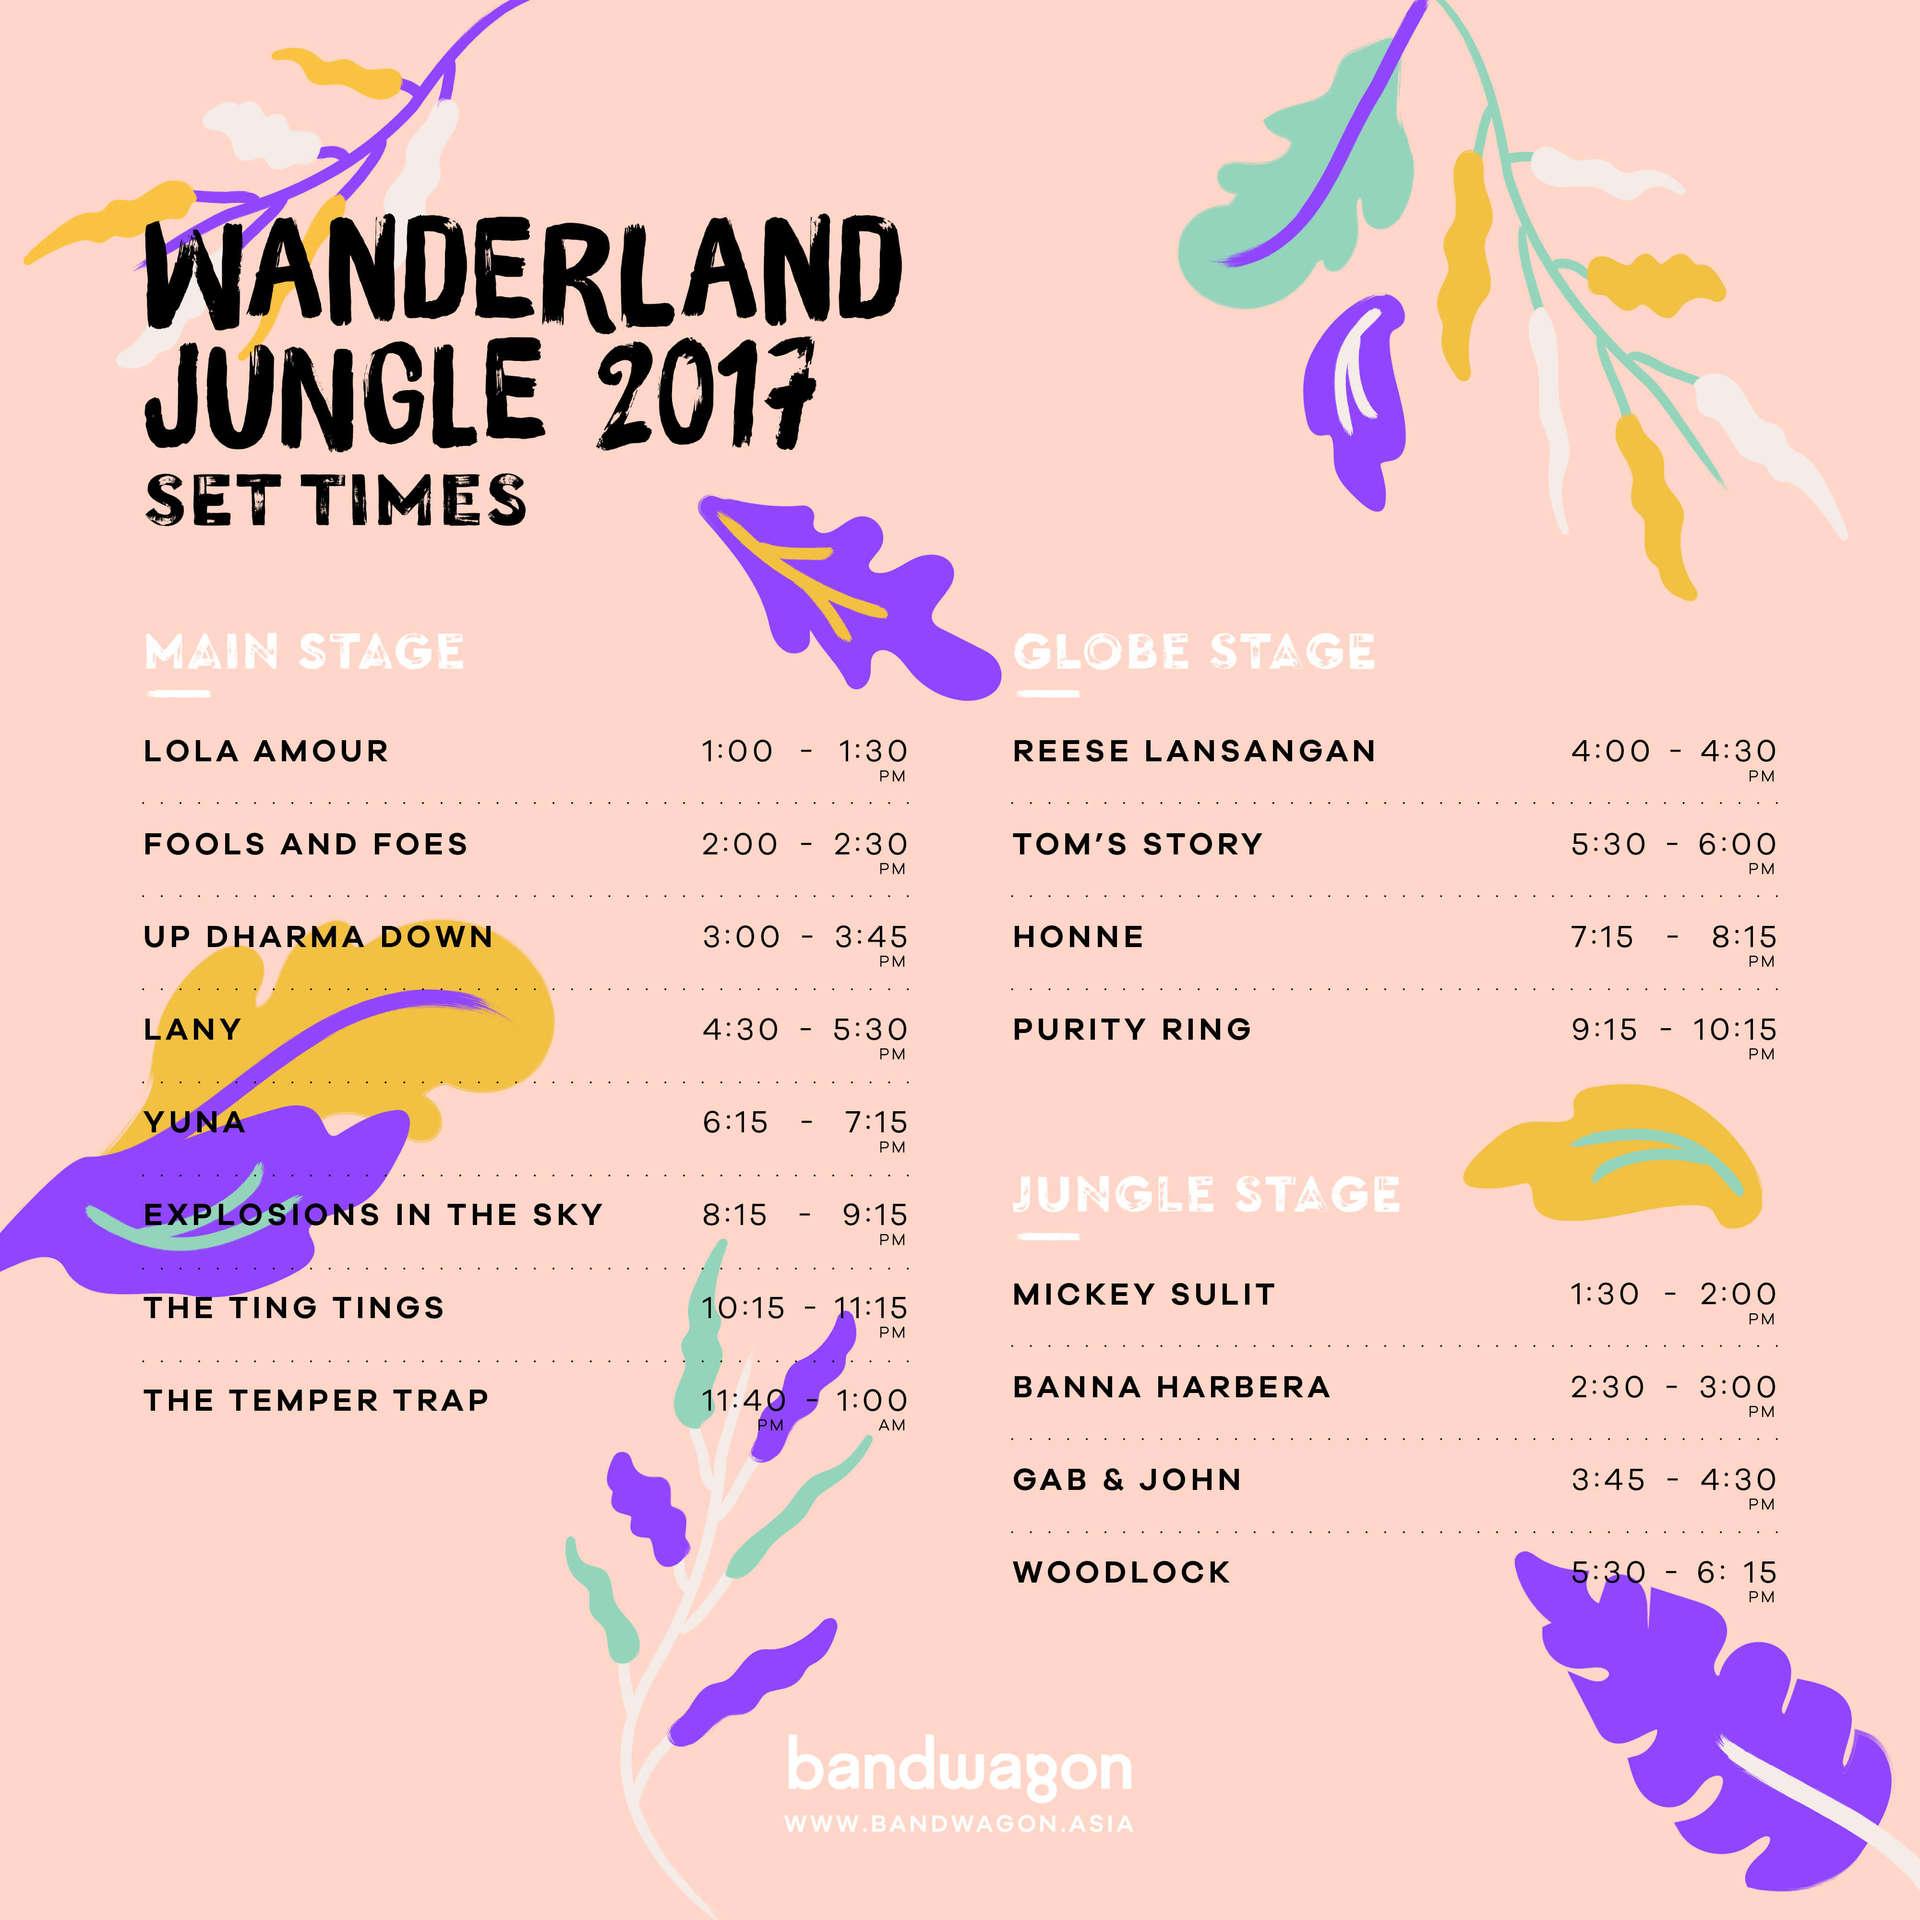 wanderland 2017 bandwagon asia yuna temper trap phoenix